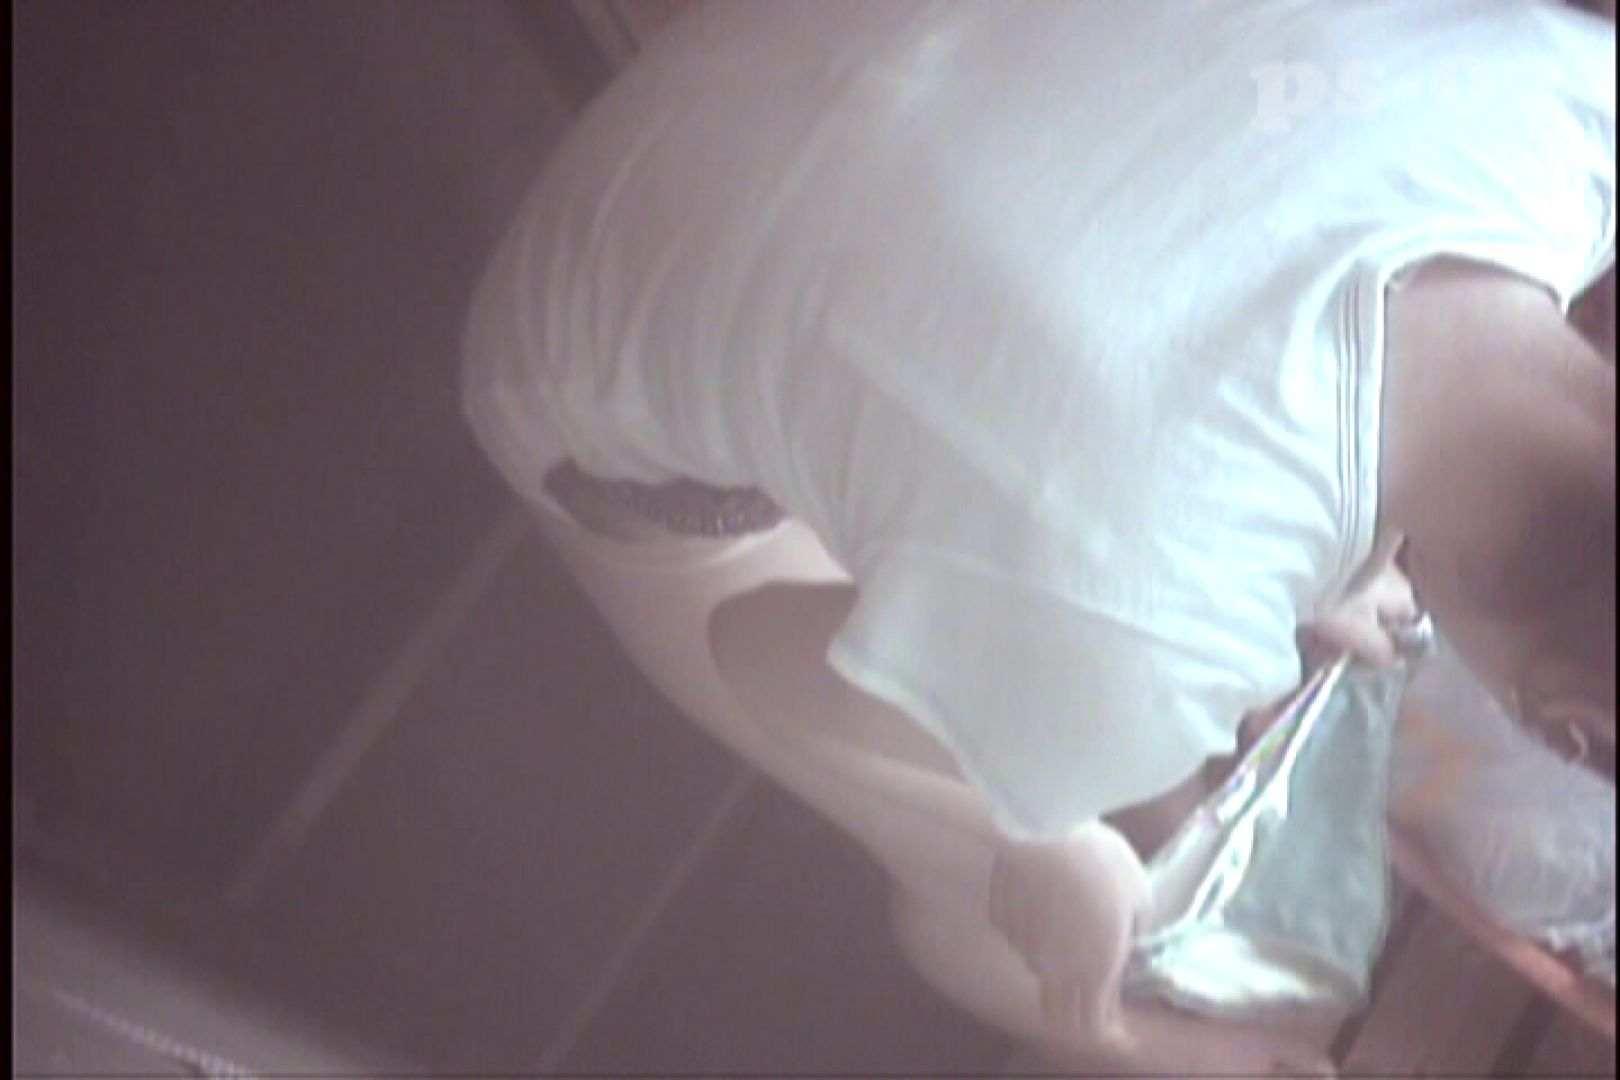 File.15 はみ出る陰毛のチェックに余念がないギャル ギャル セックス無修正動画無料 94連発 26